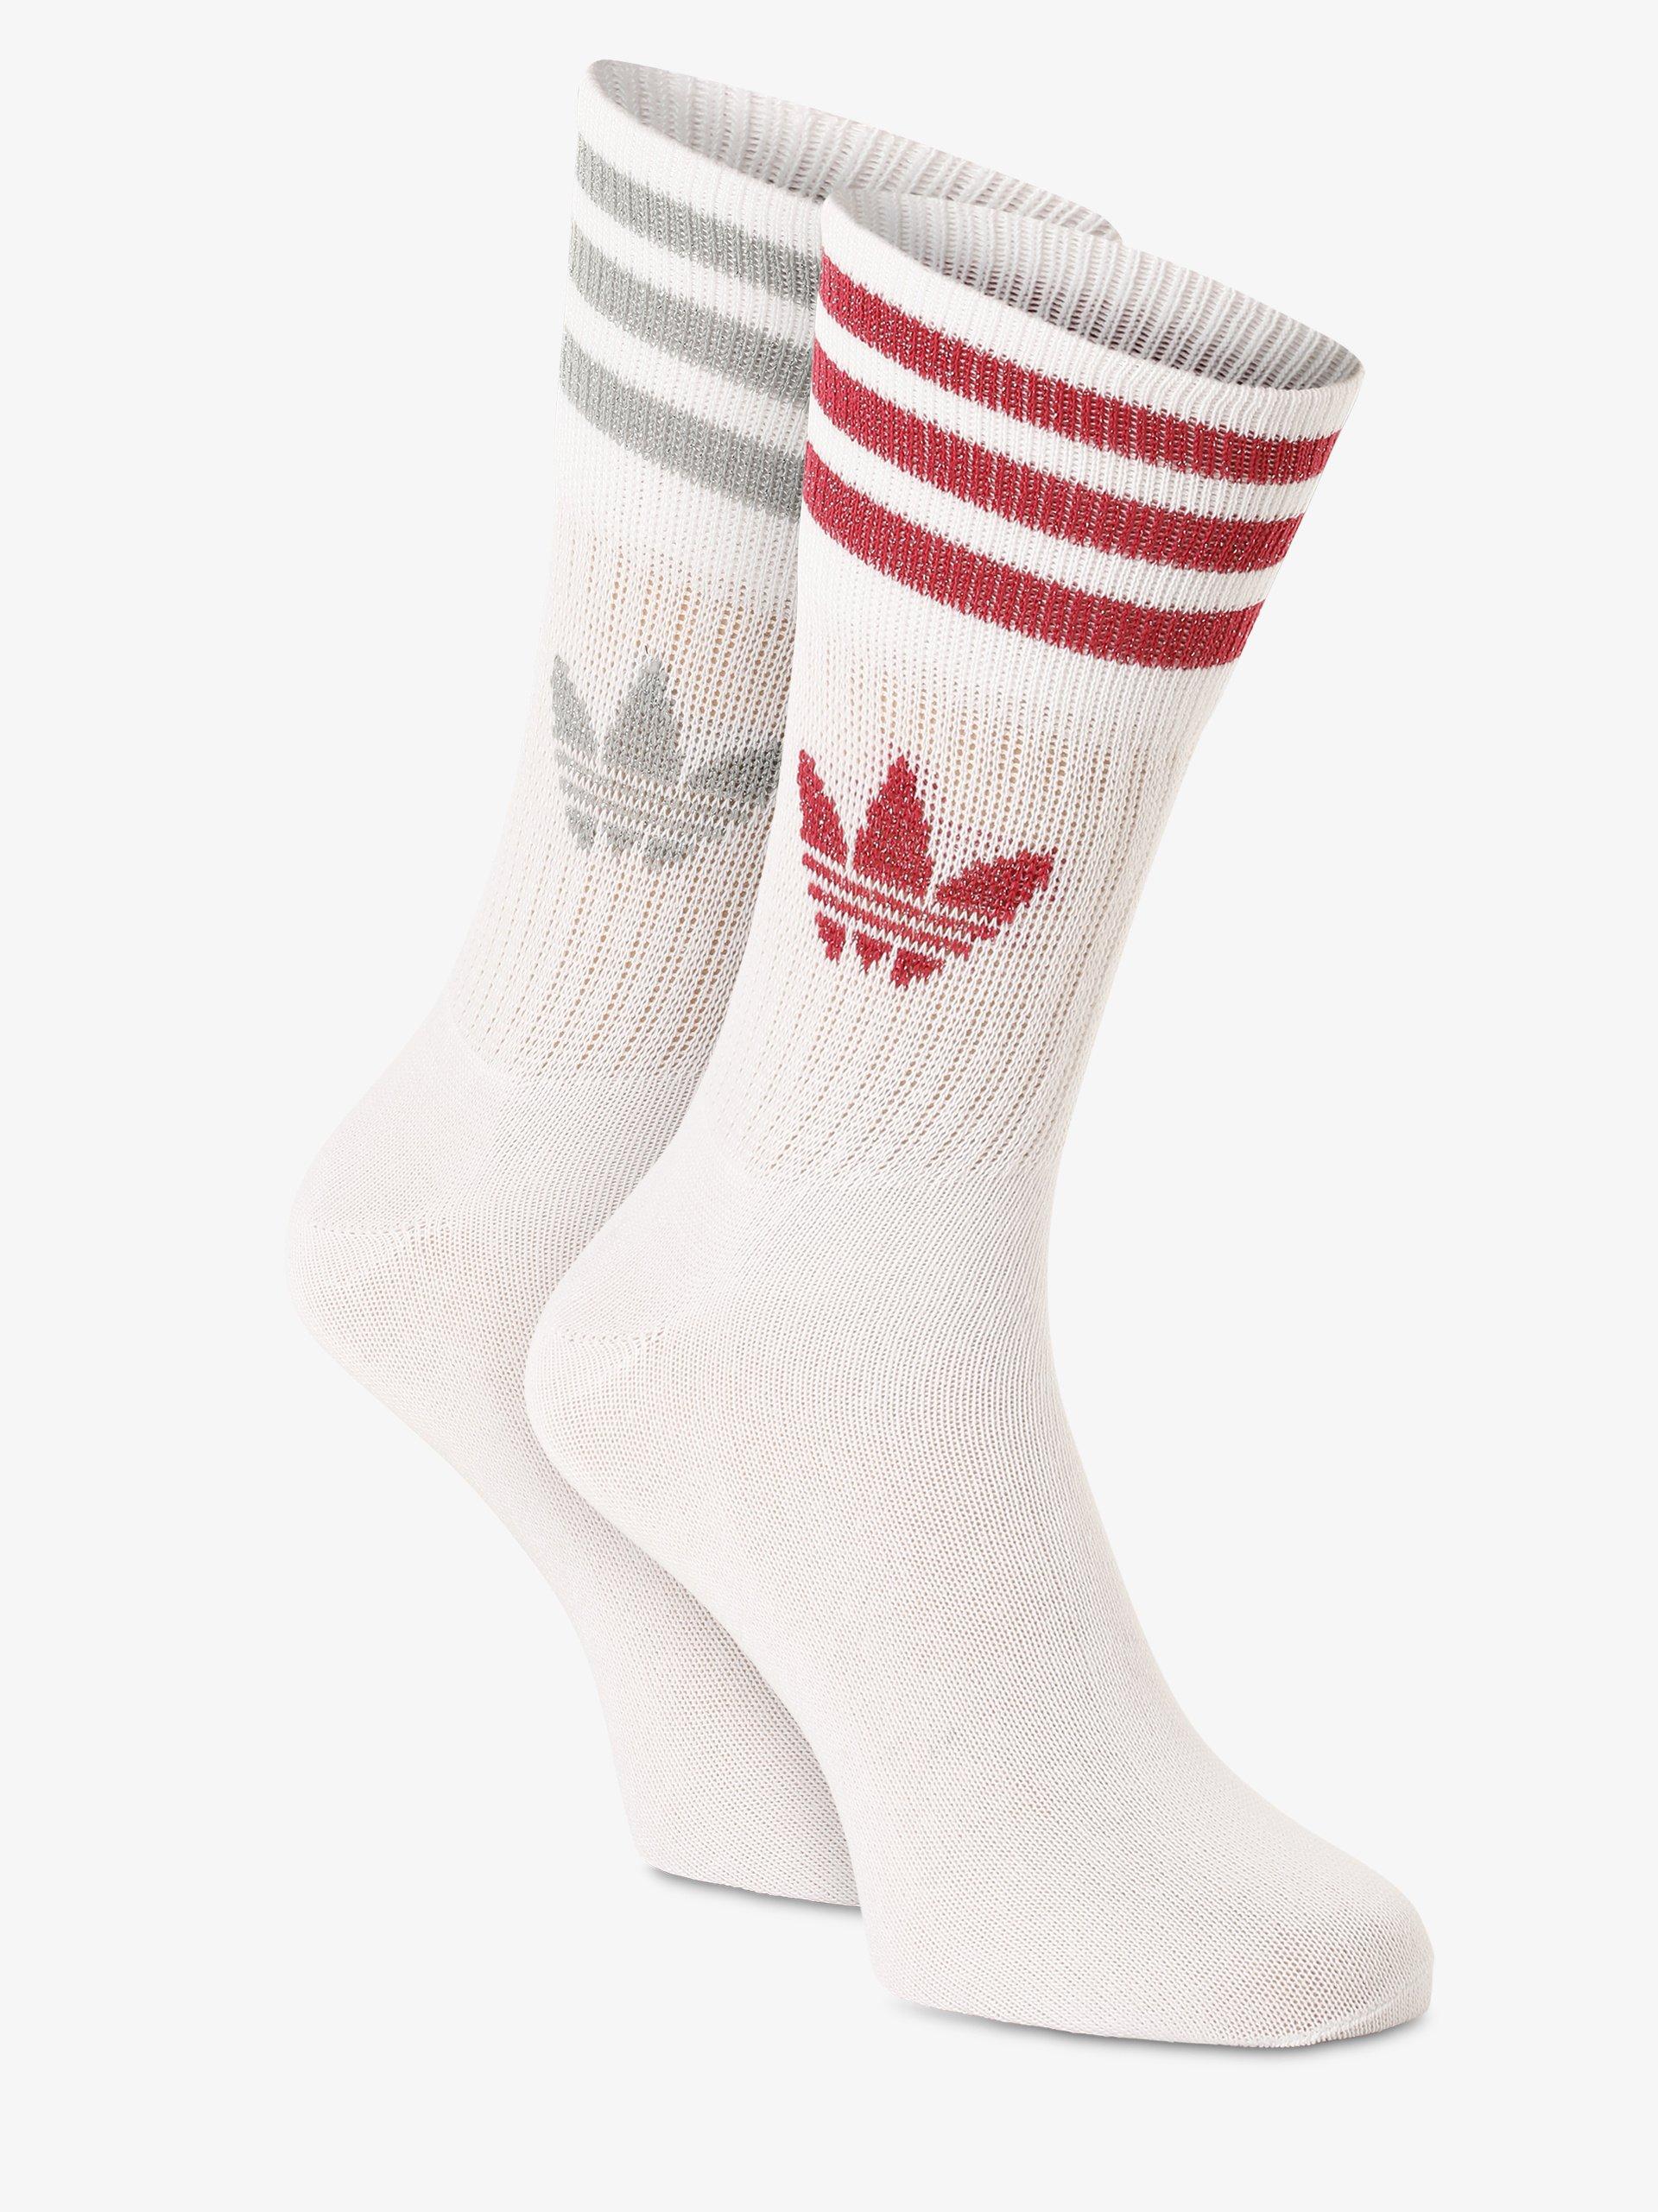 adidas Originals Damen Socken im 2er-Pack